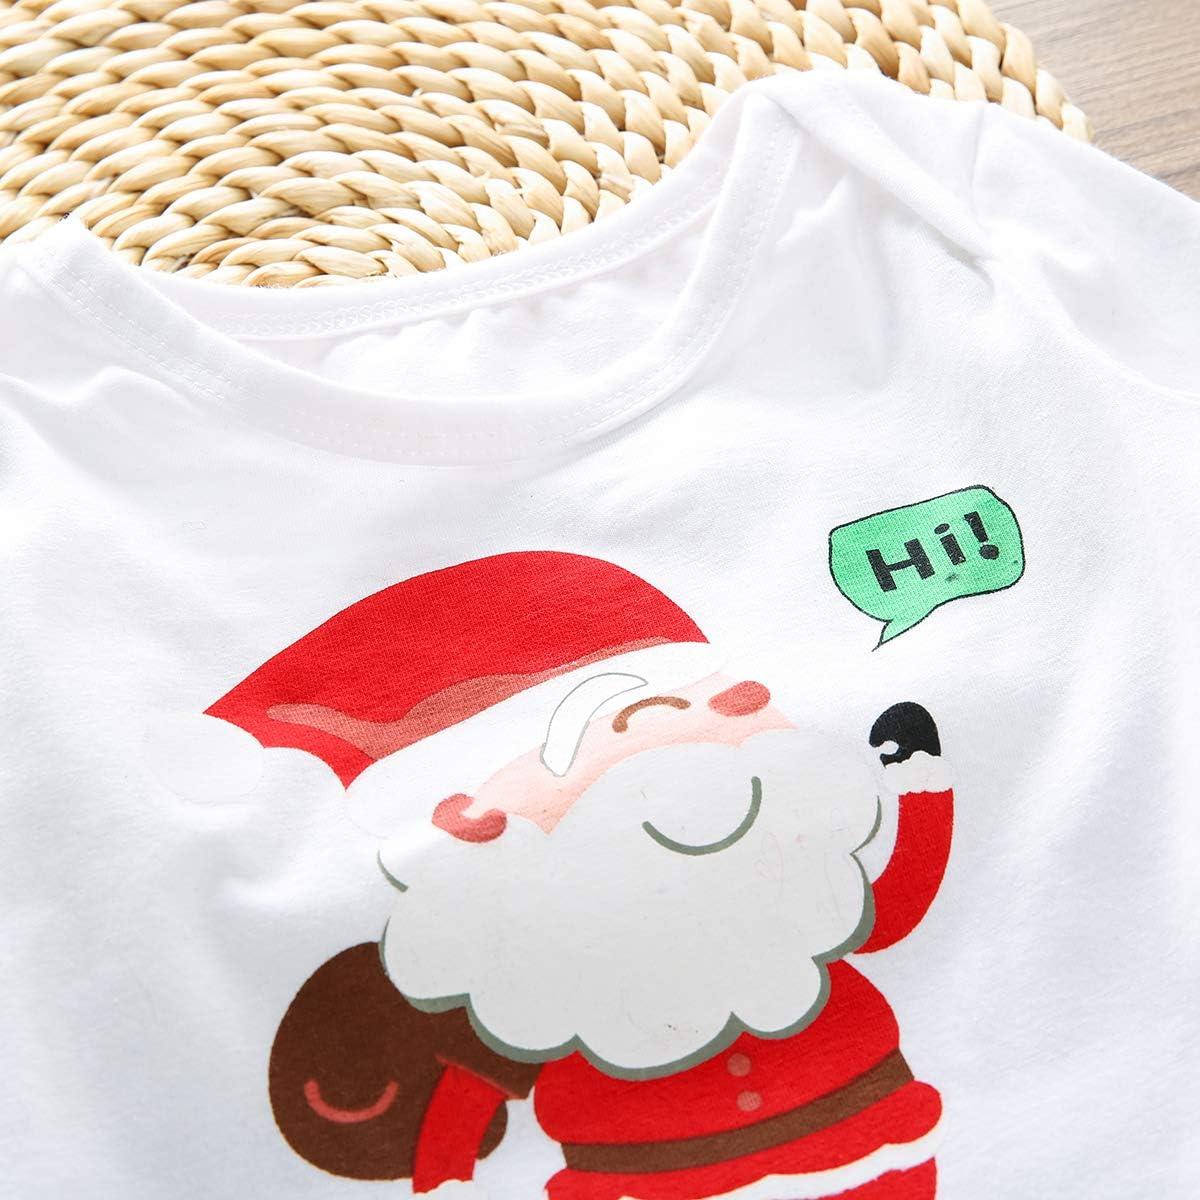 3Pcs Skirt Set Infant Baby Girls Outfits Long Sleeve Romper Top Plaid Dress Headband Clothes